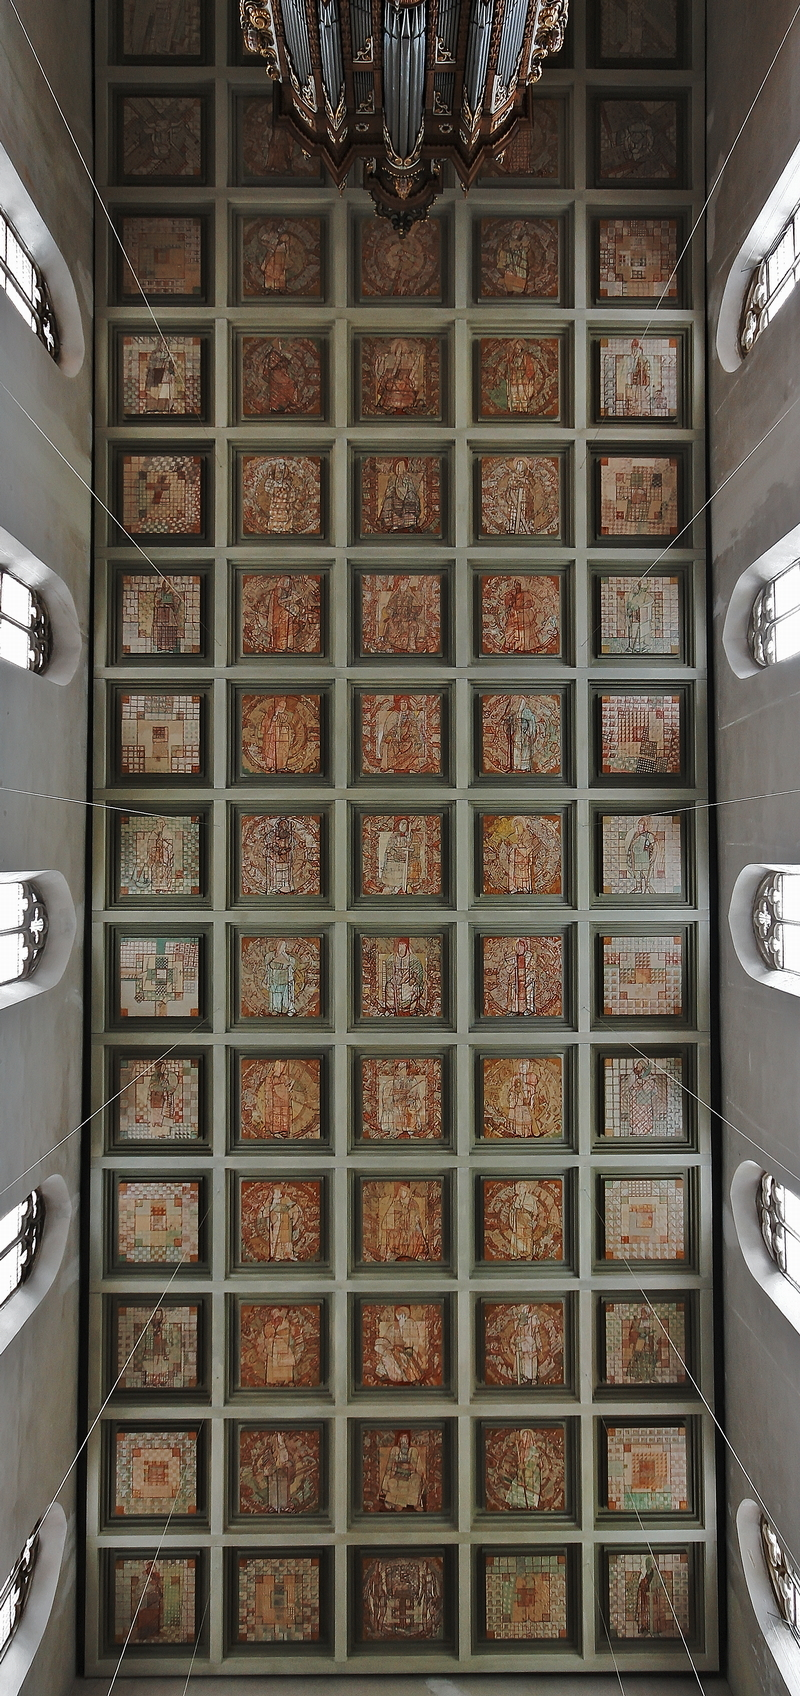 St. Pantaleon, Cologne: Ceiling